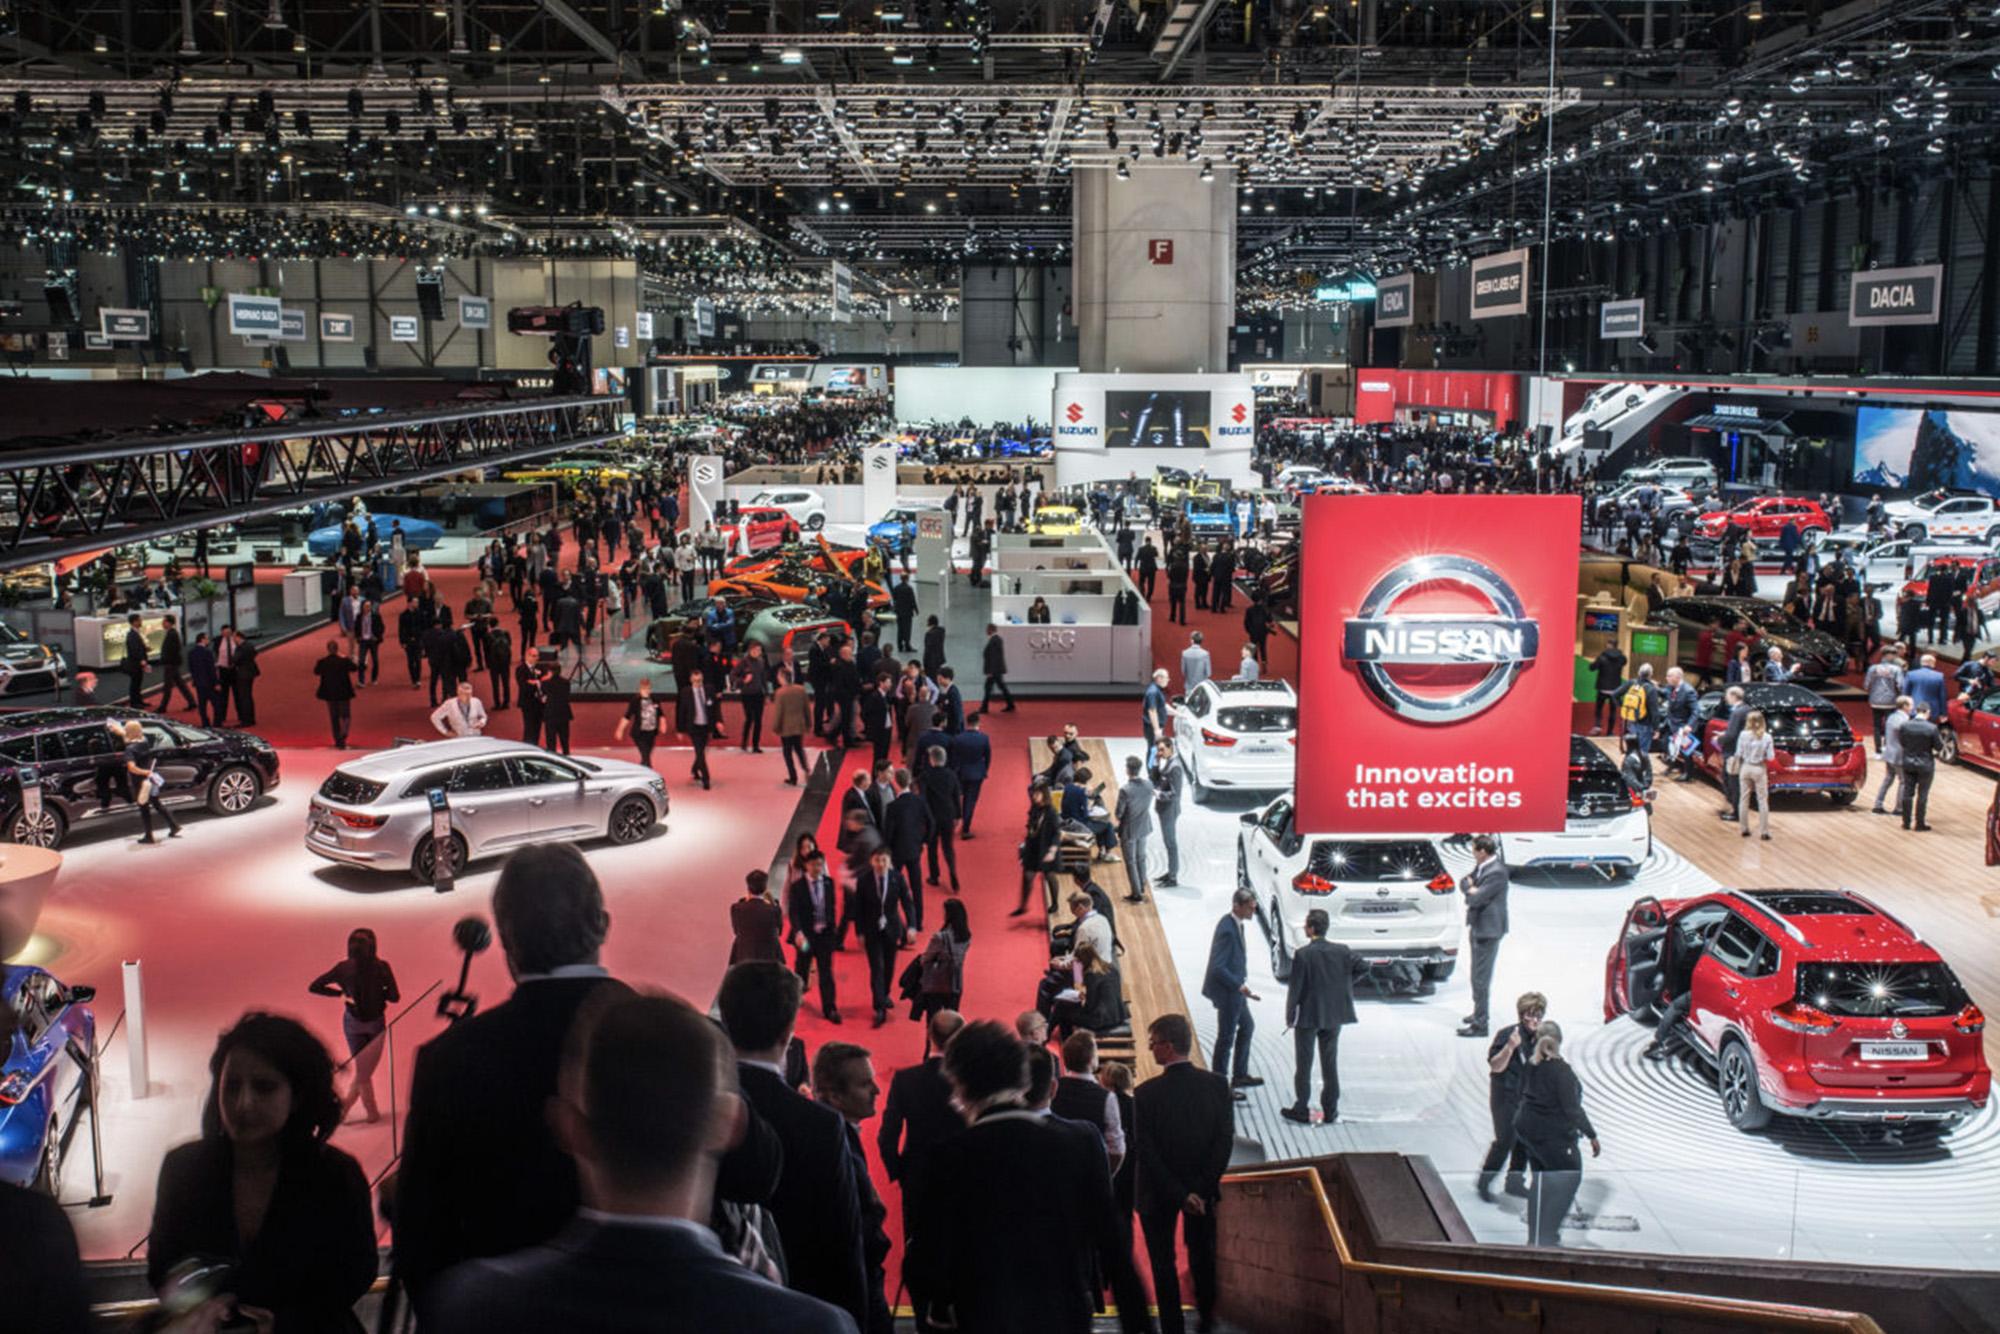 Crowds at the 2019 Geneva Motor Show